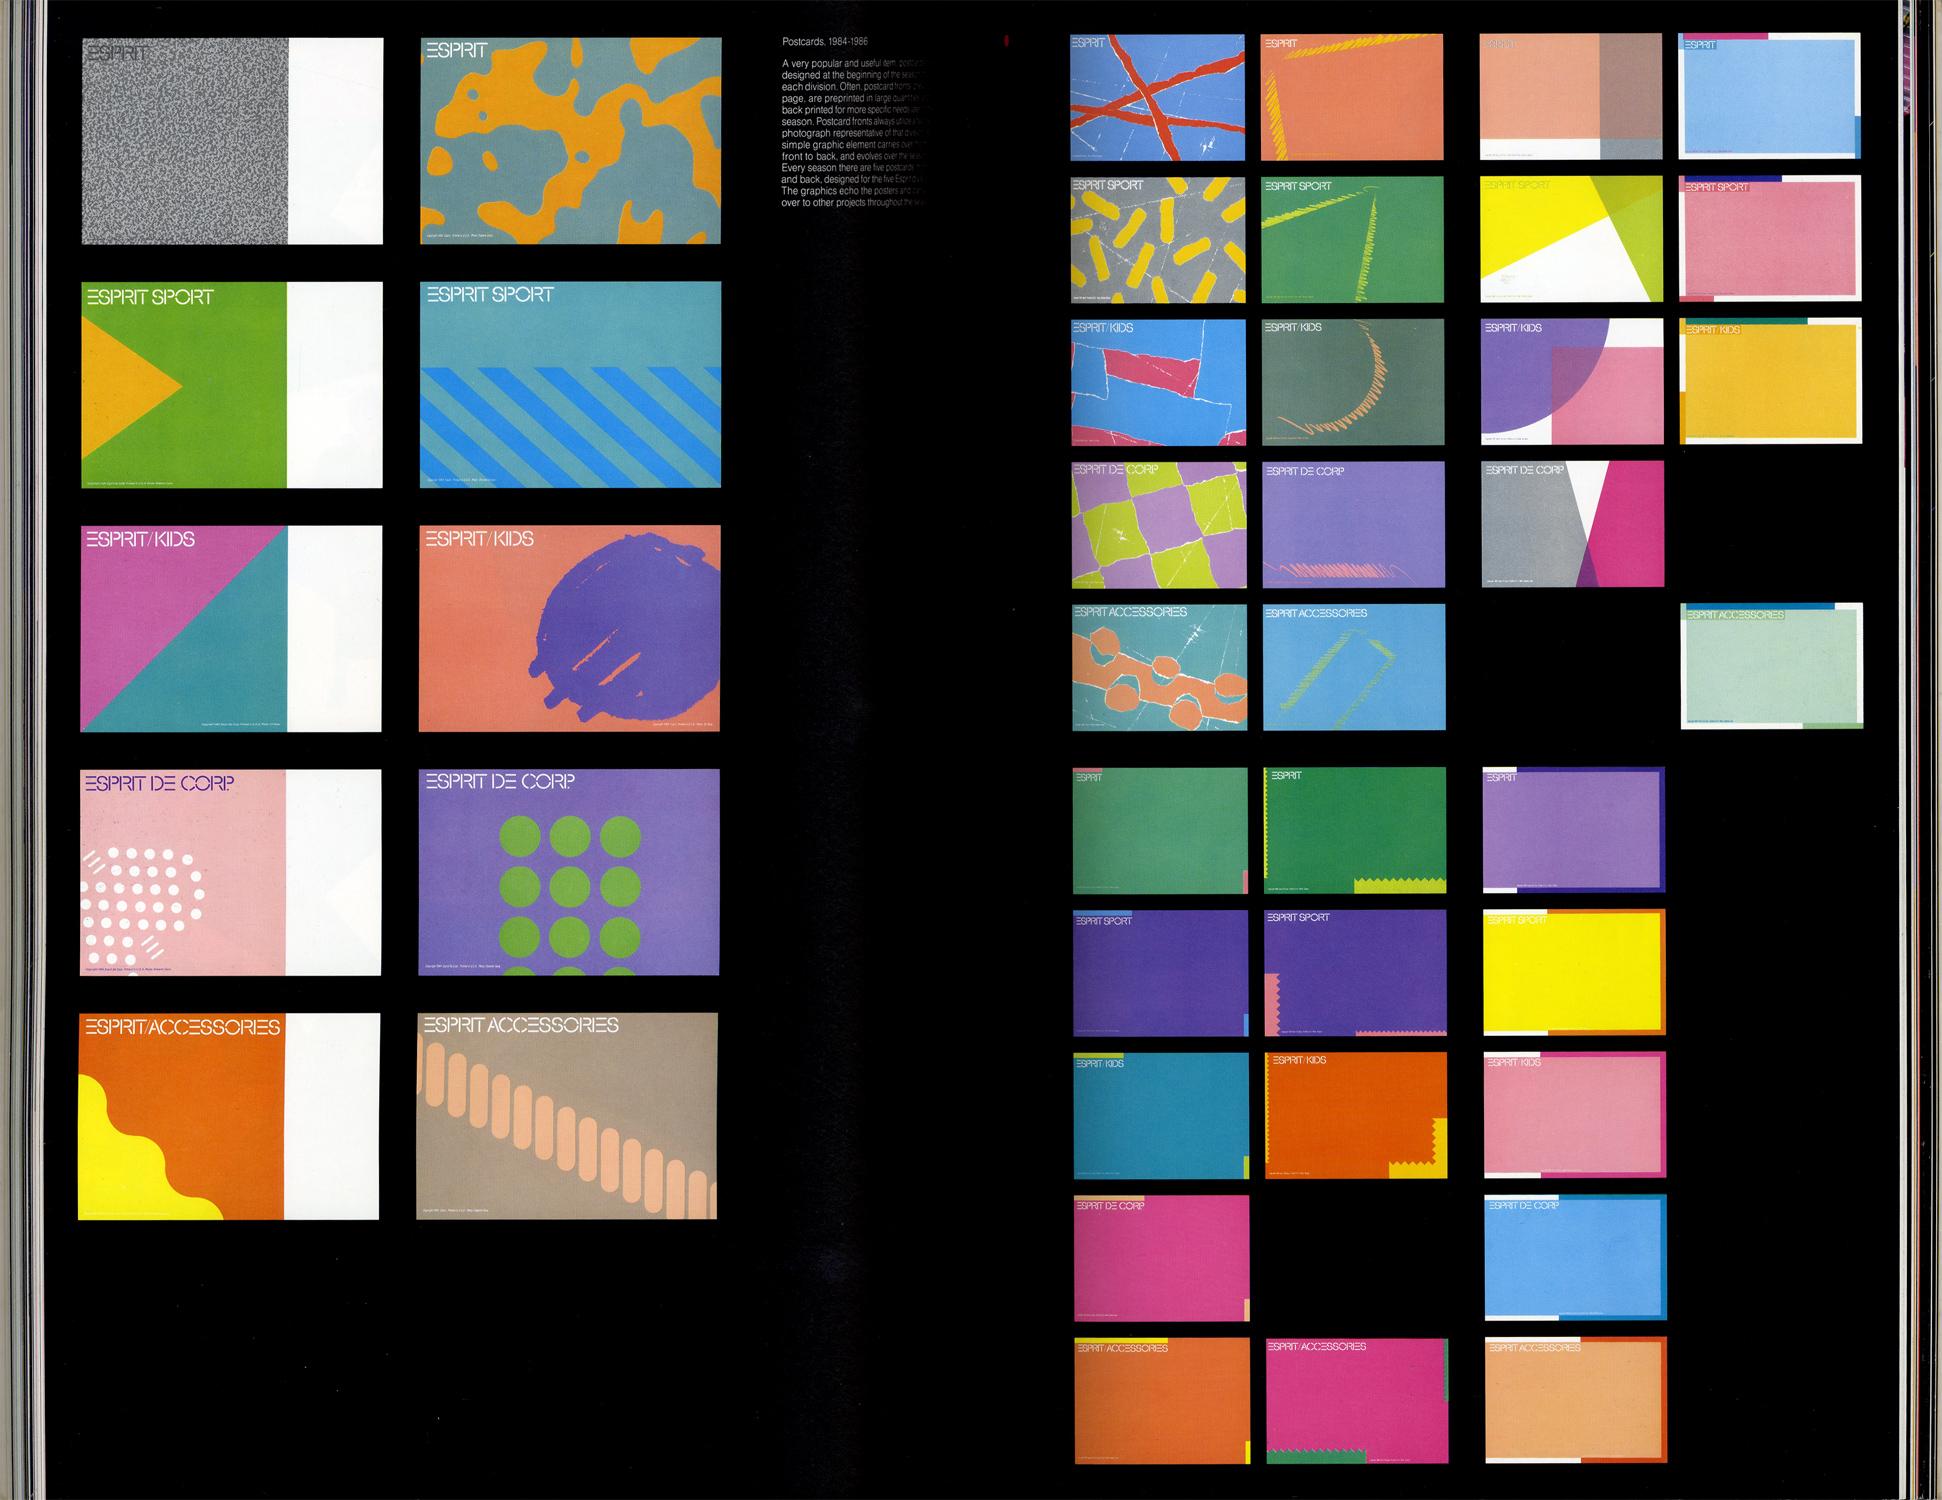 ESPRIT'S GRAPHIC WORKS 1984-1986[image5]